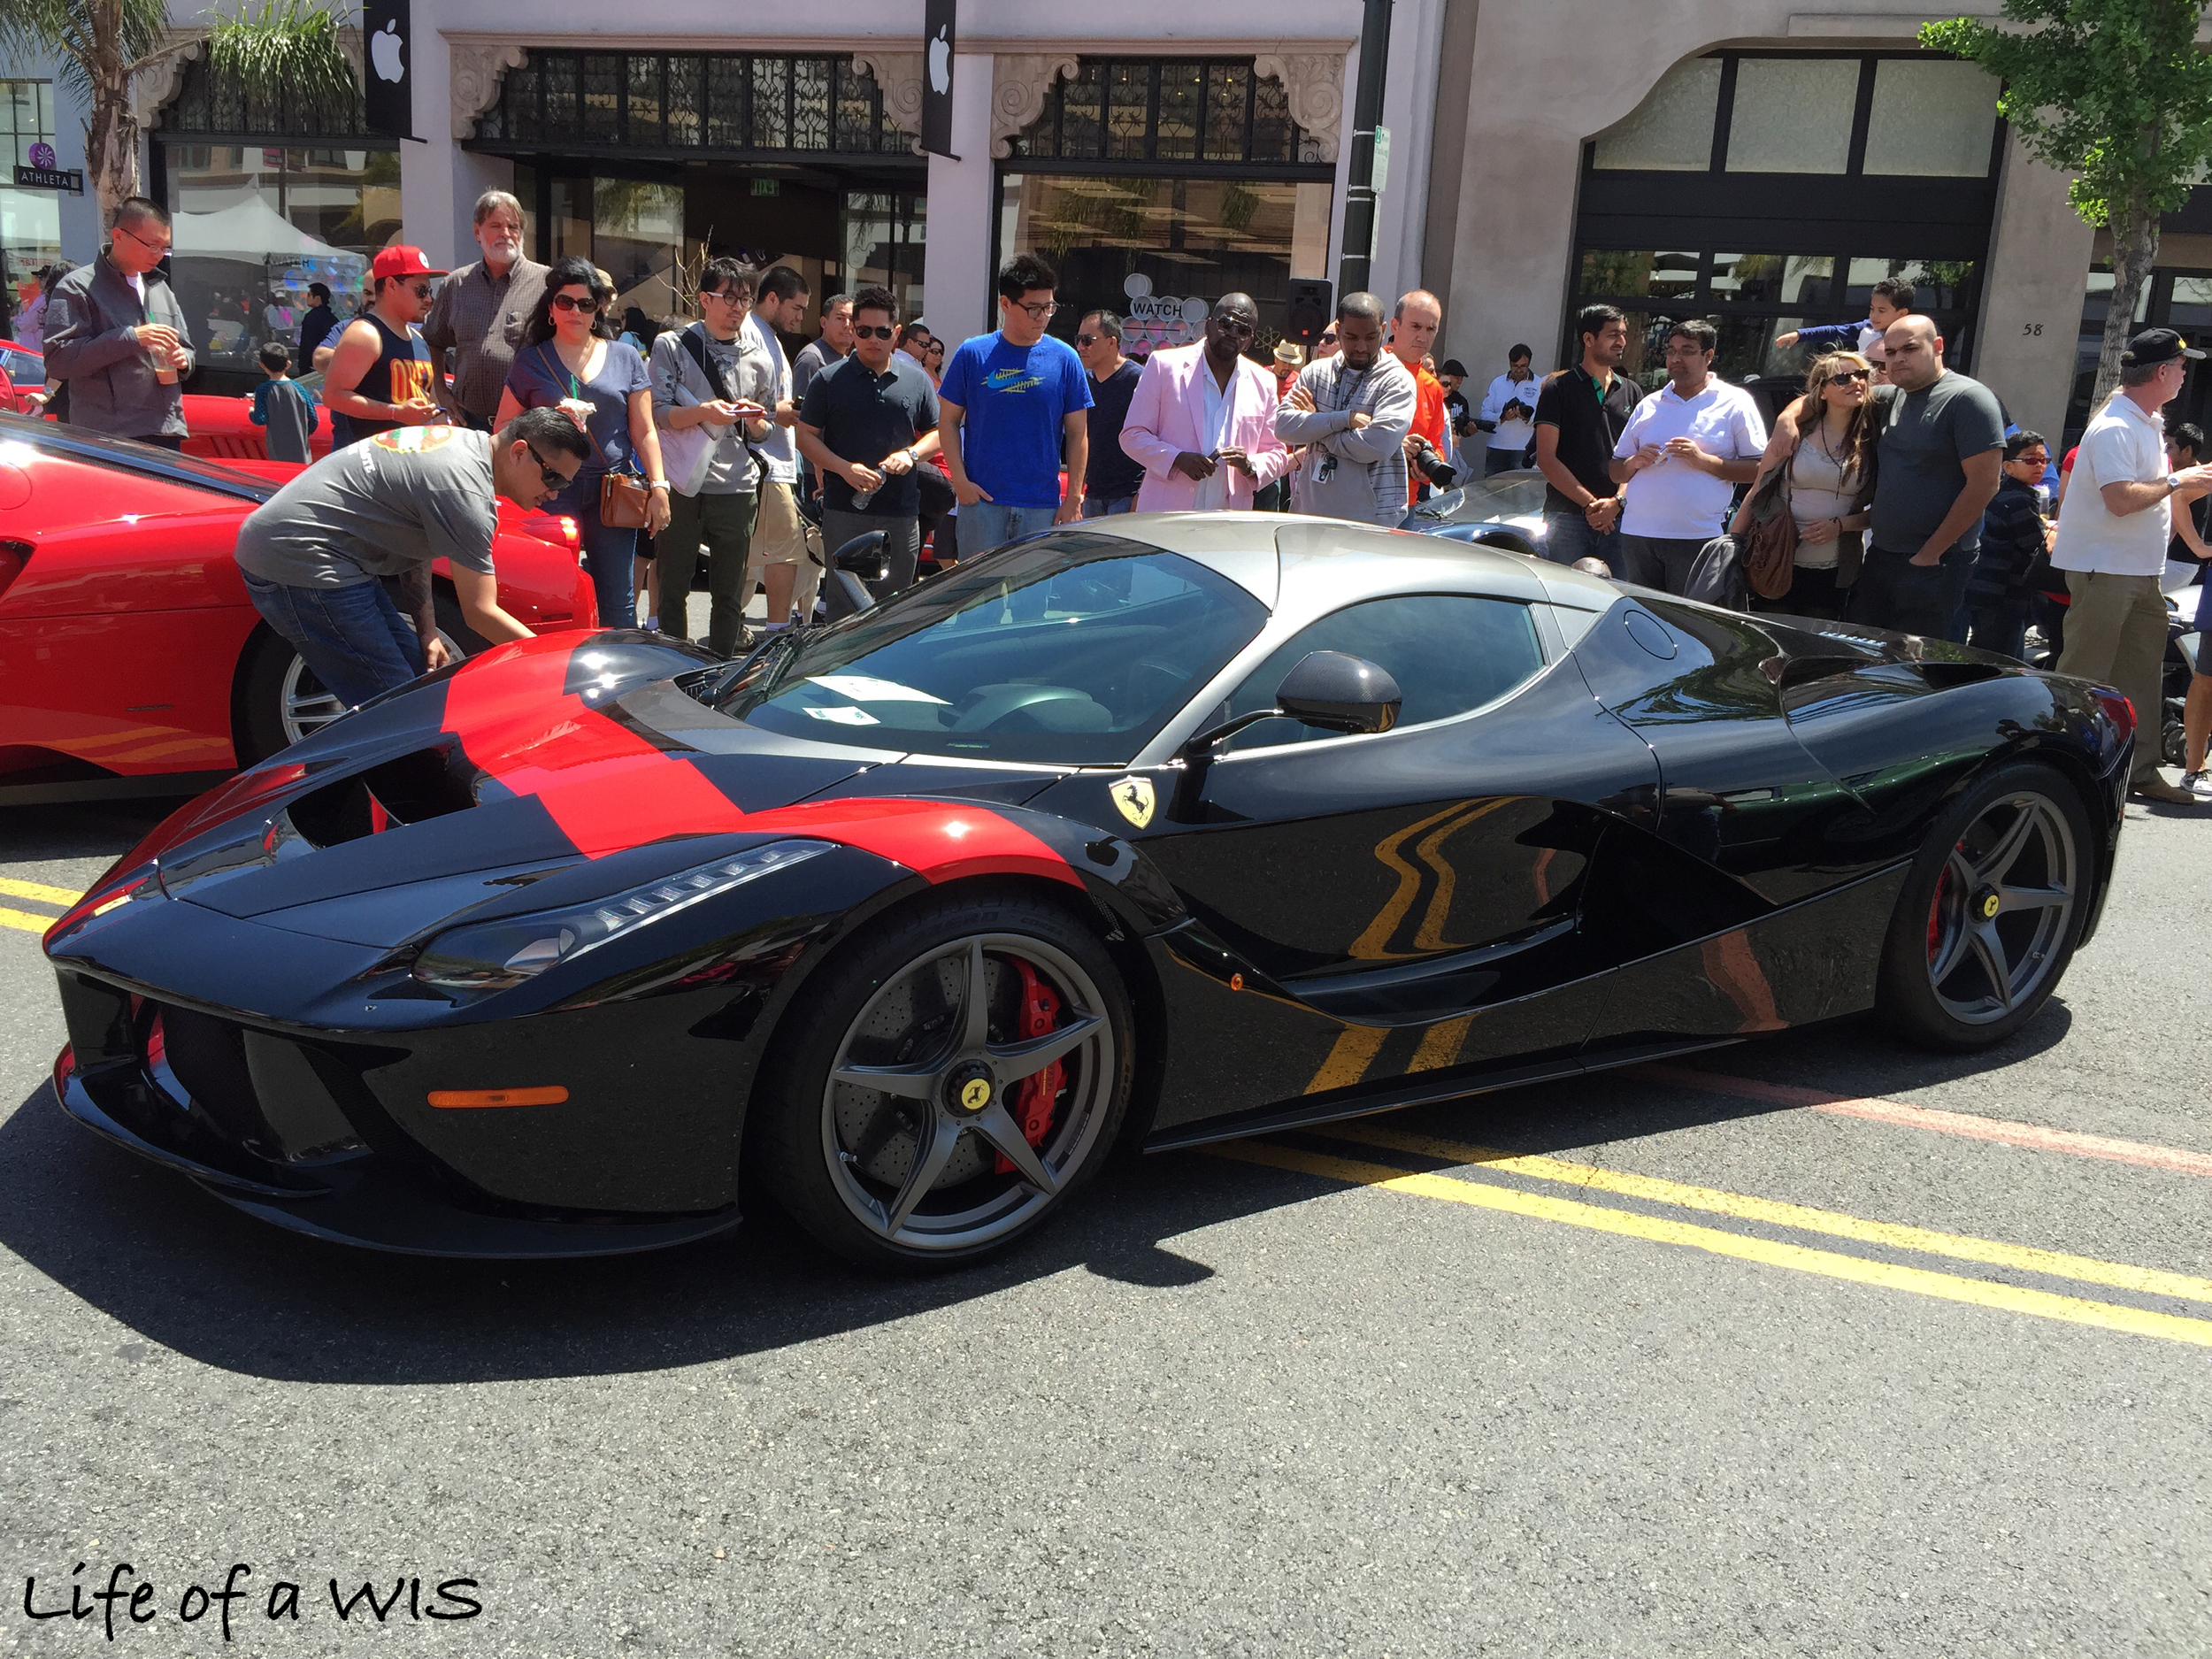 The show stopper? This gorgeous La Ferrari...